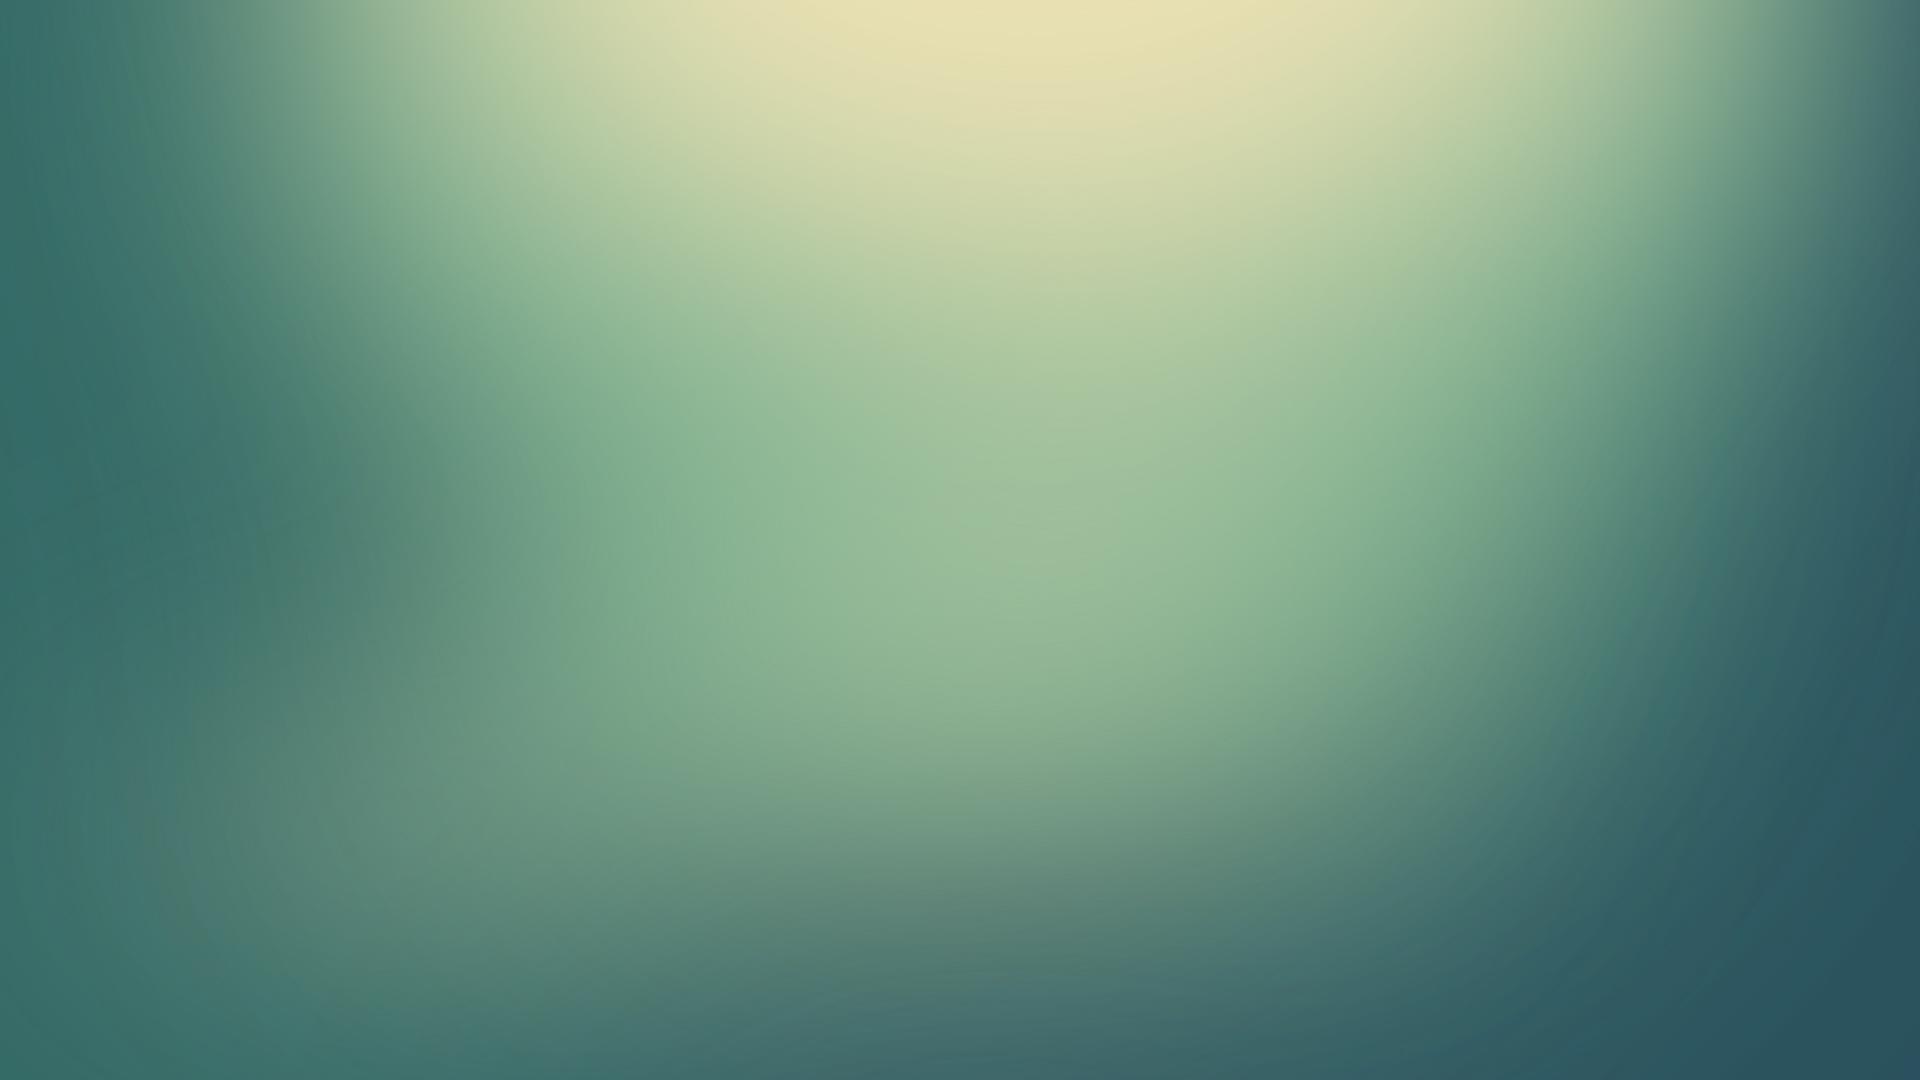 Subtle HD wallpaper #1516104